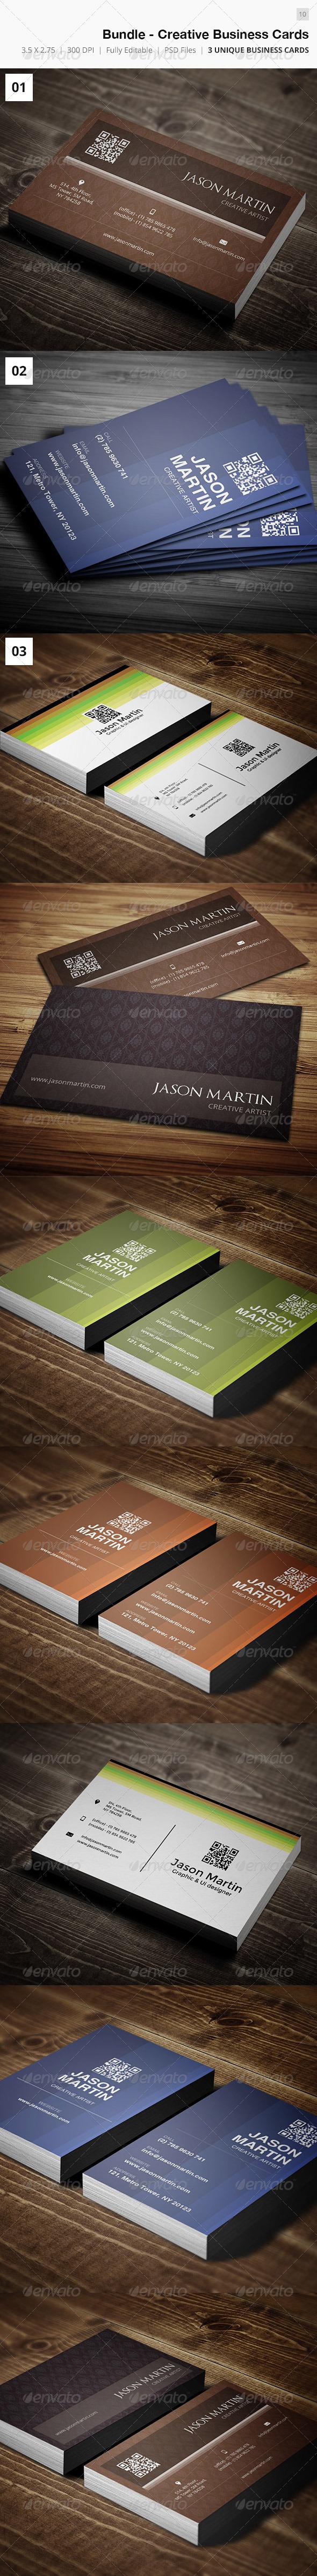 Bundle - Creative Business Card - 10 - Creative Business Cards